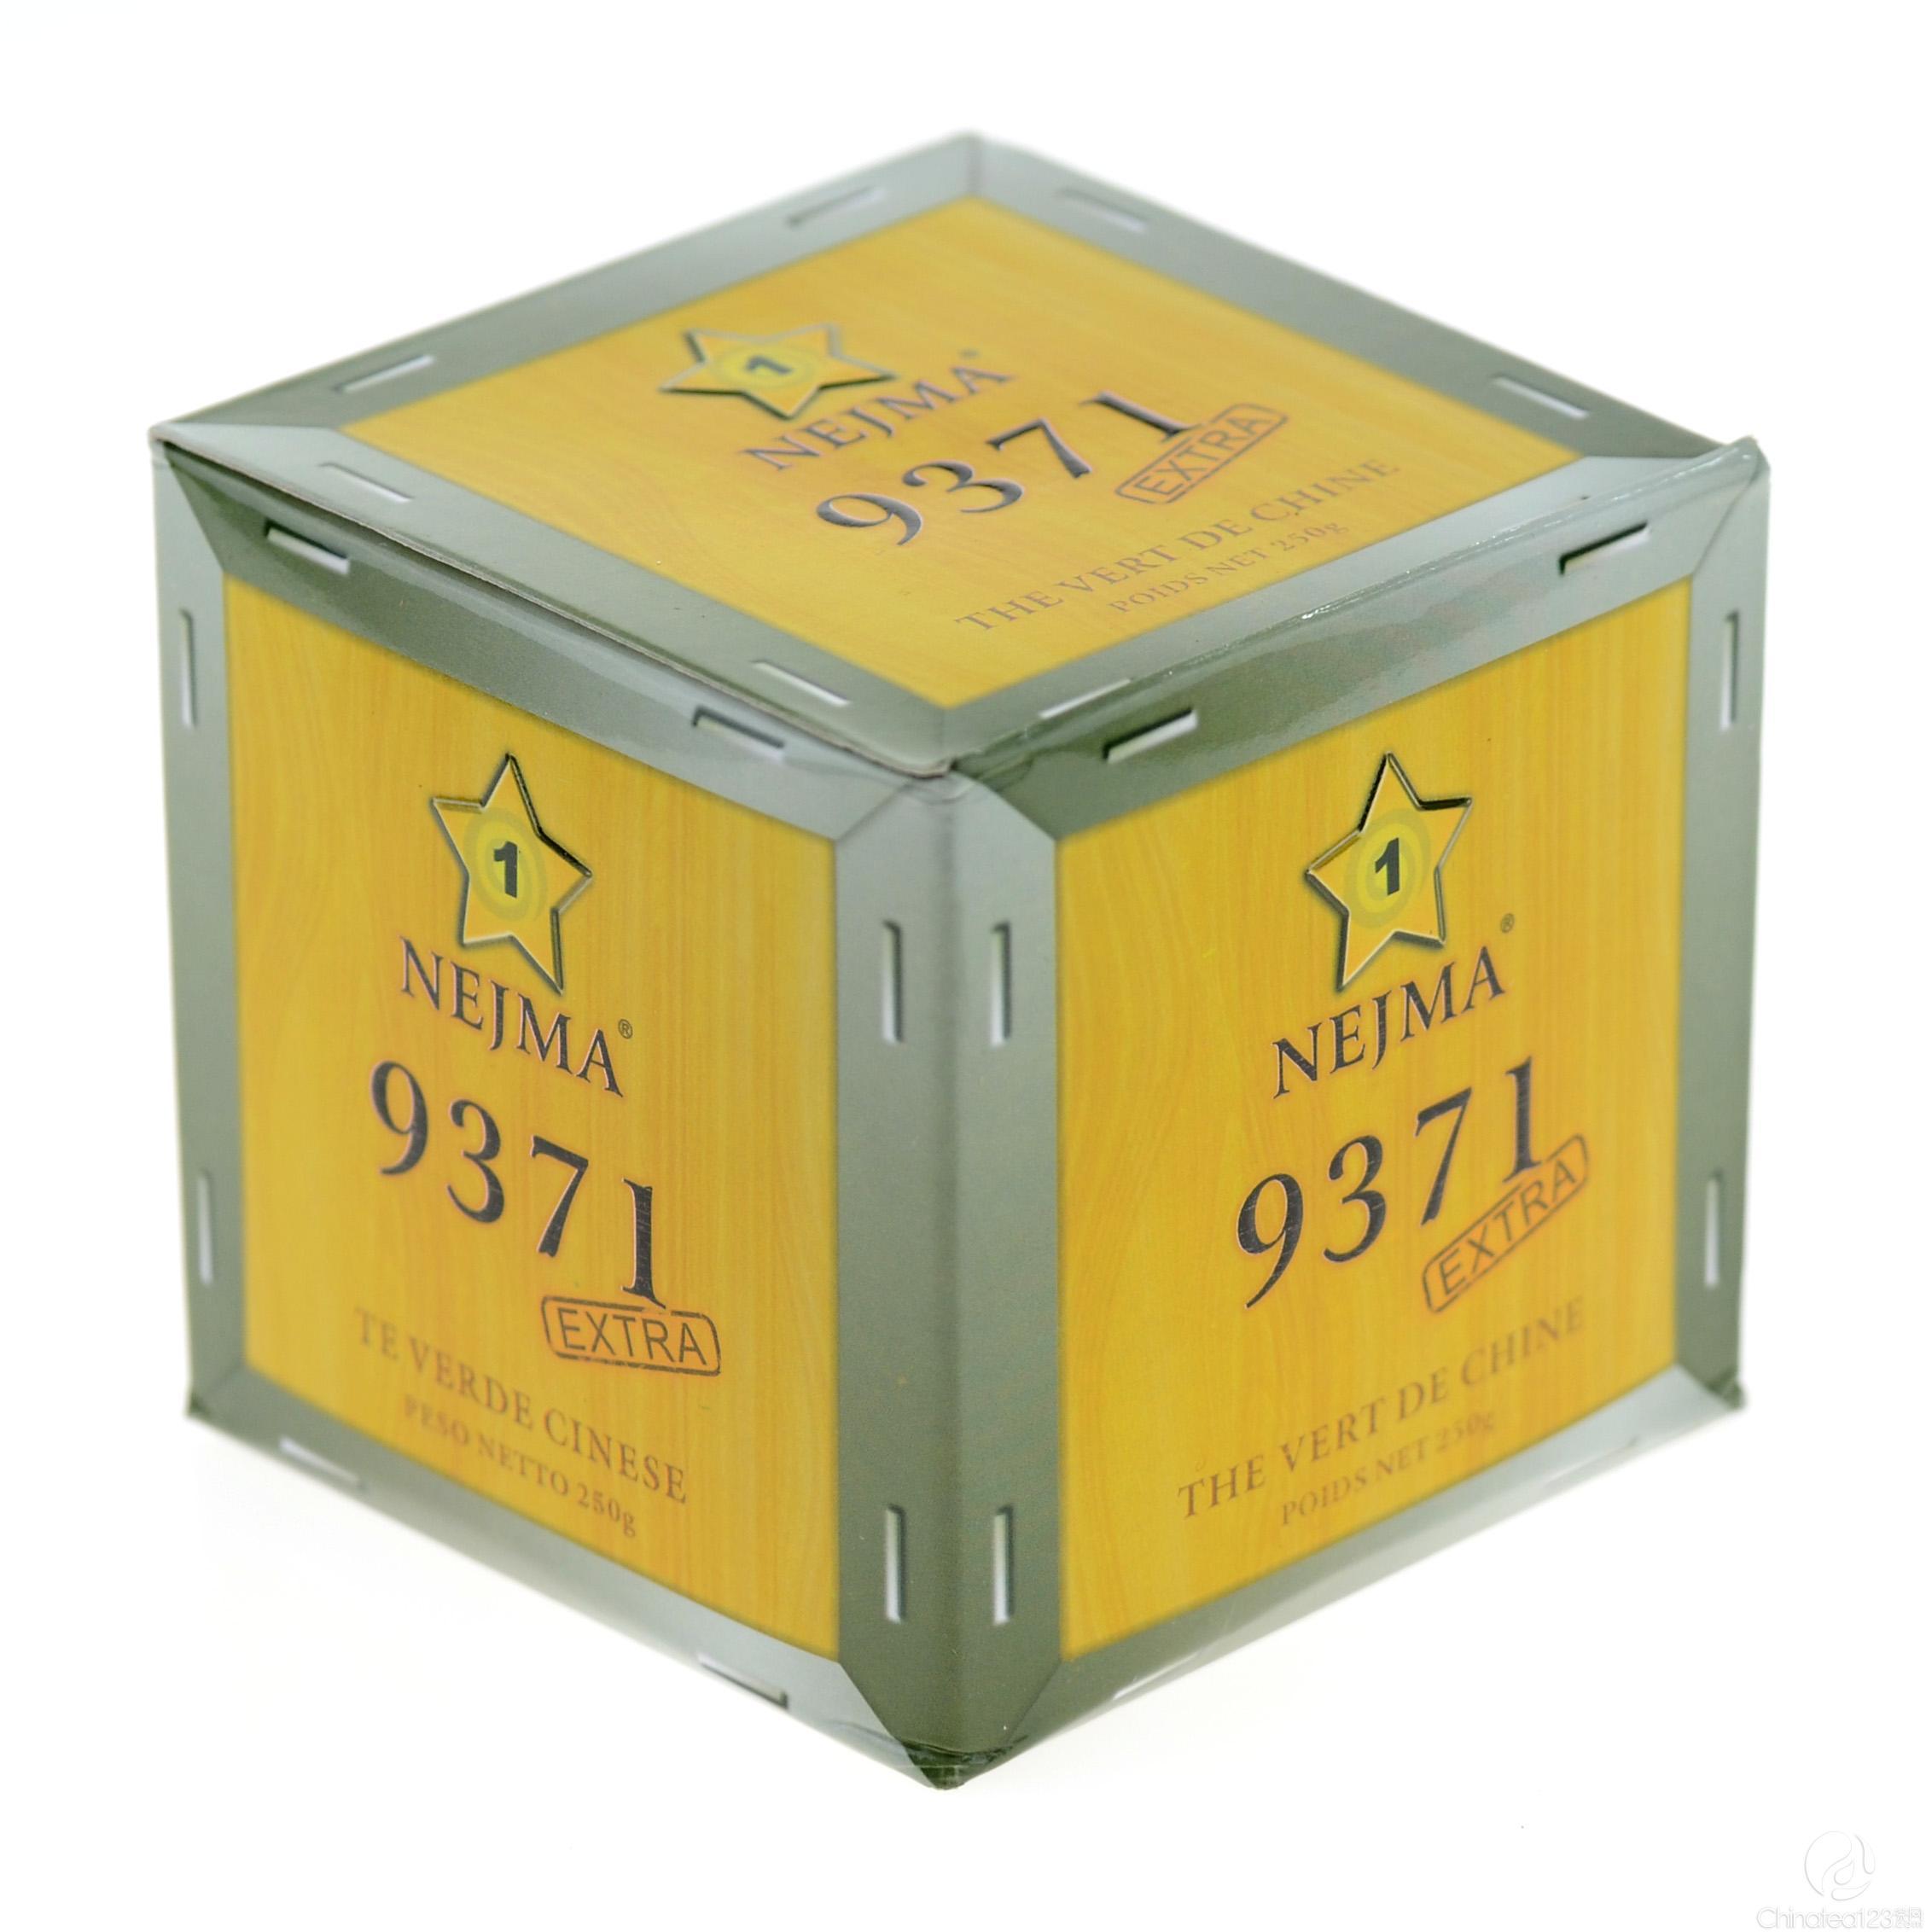 the vert 9371